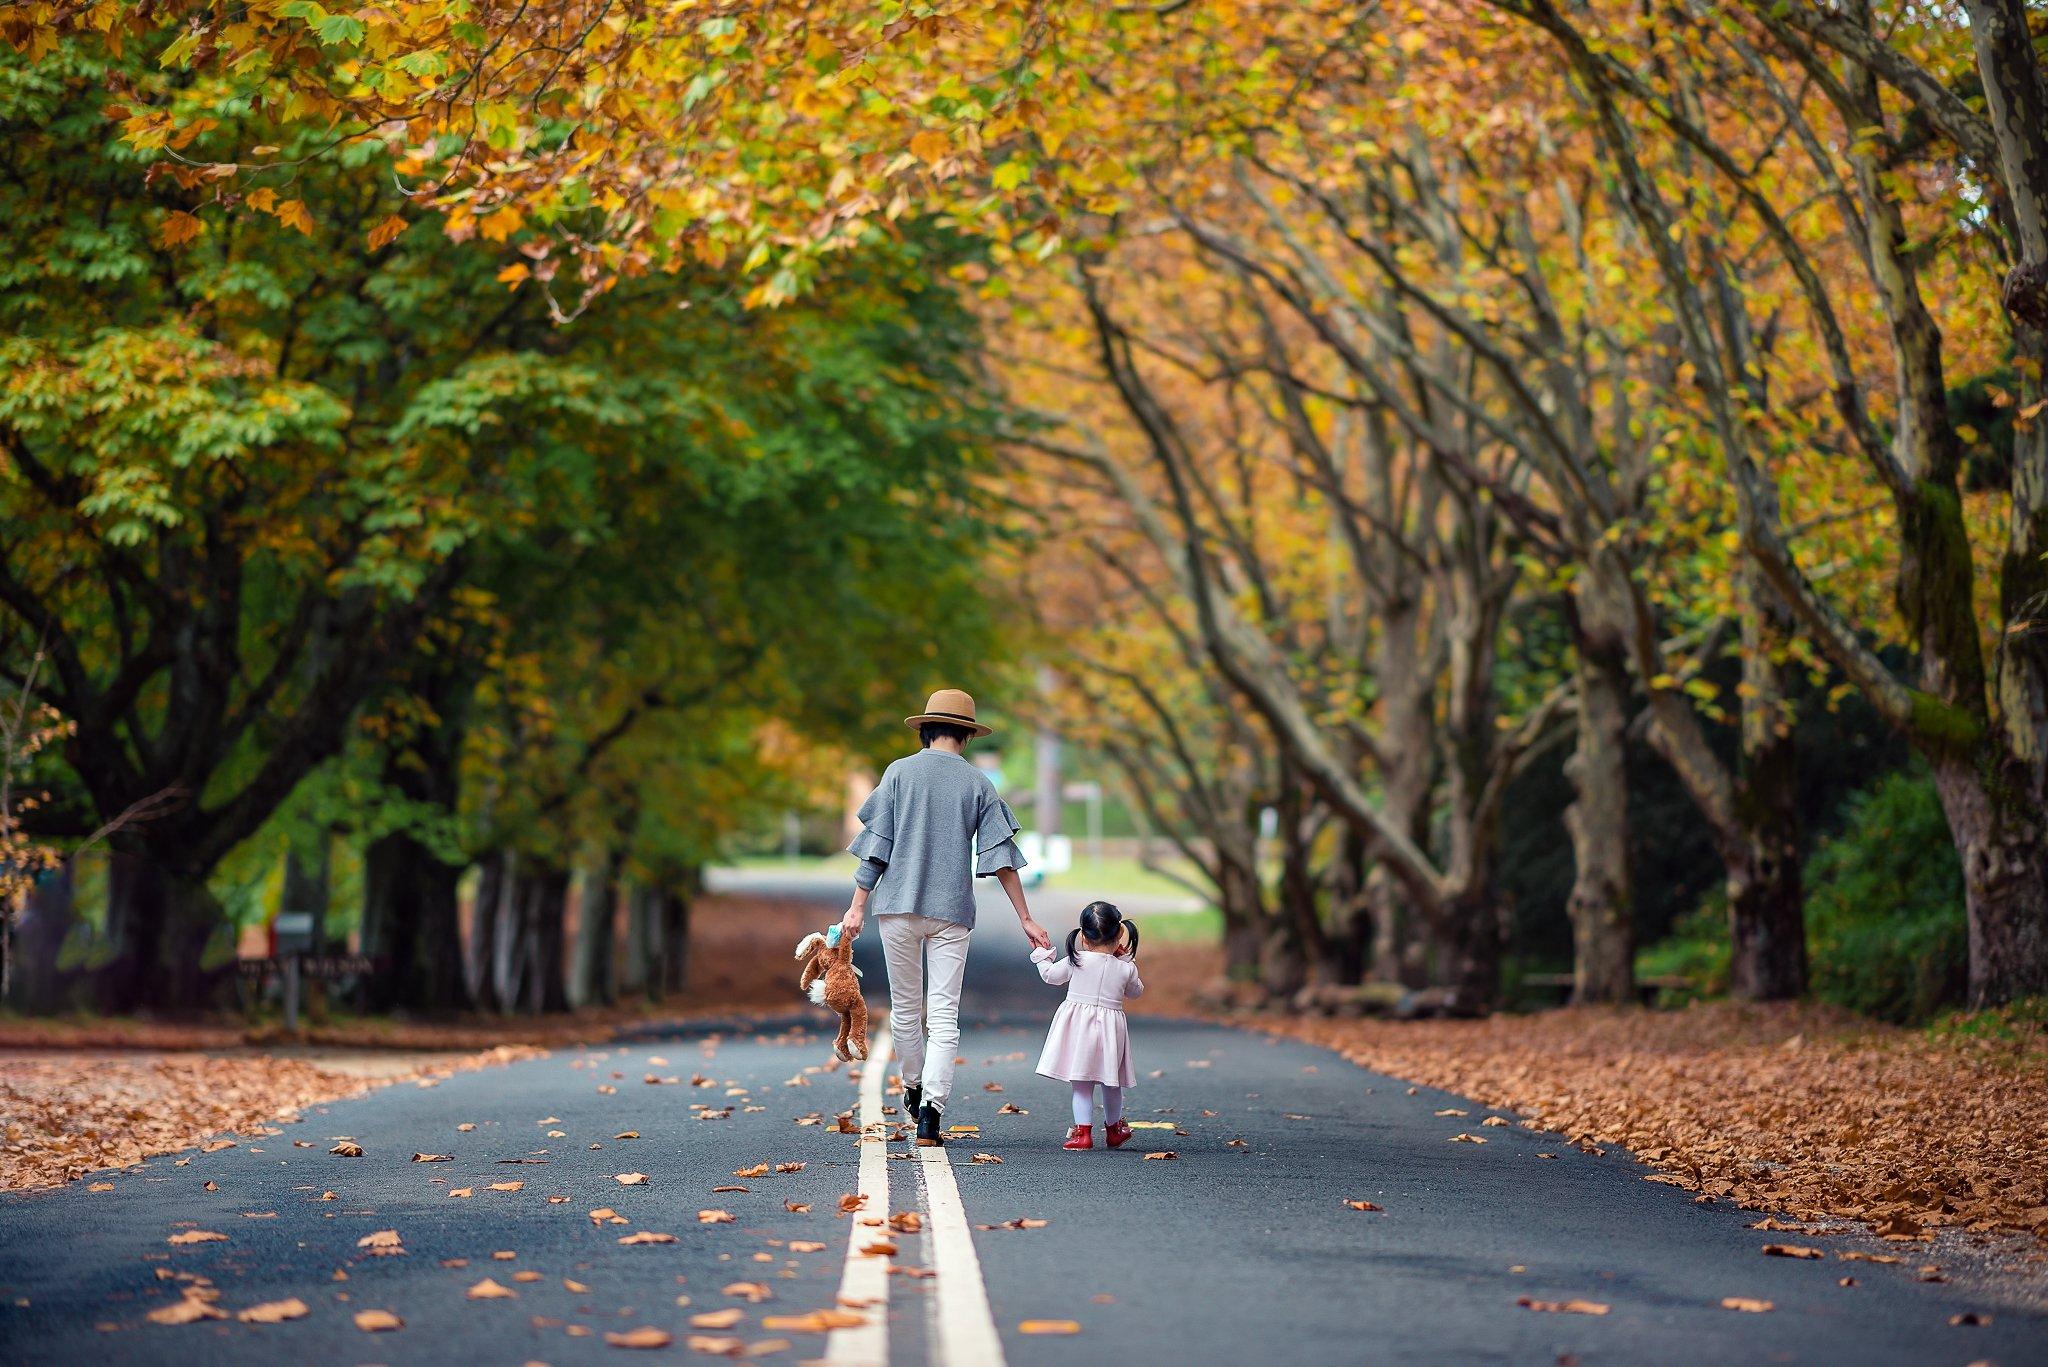 kid, girl, child, autumn, leaves, road, colours, family, together, Derek Zhang